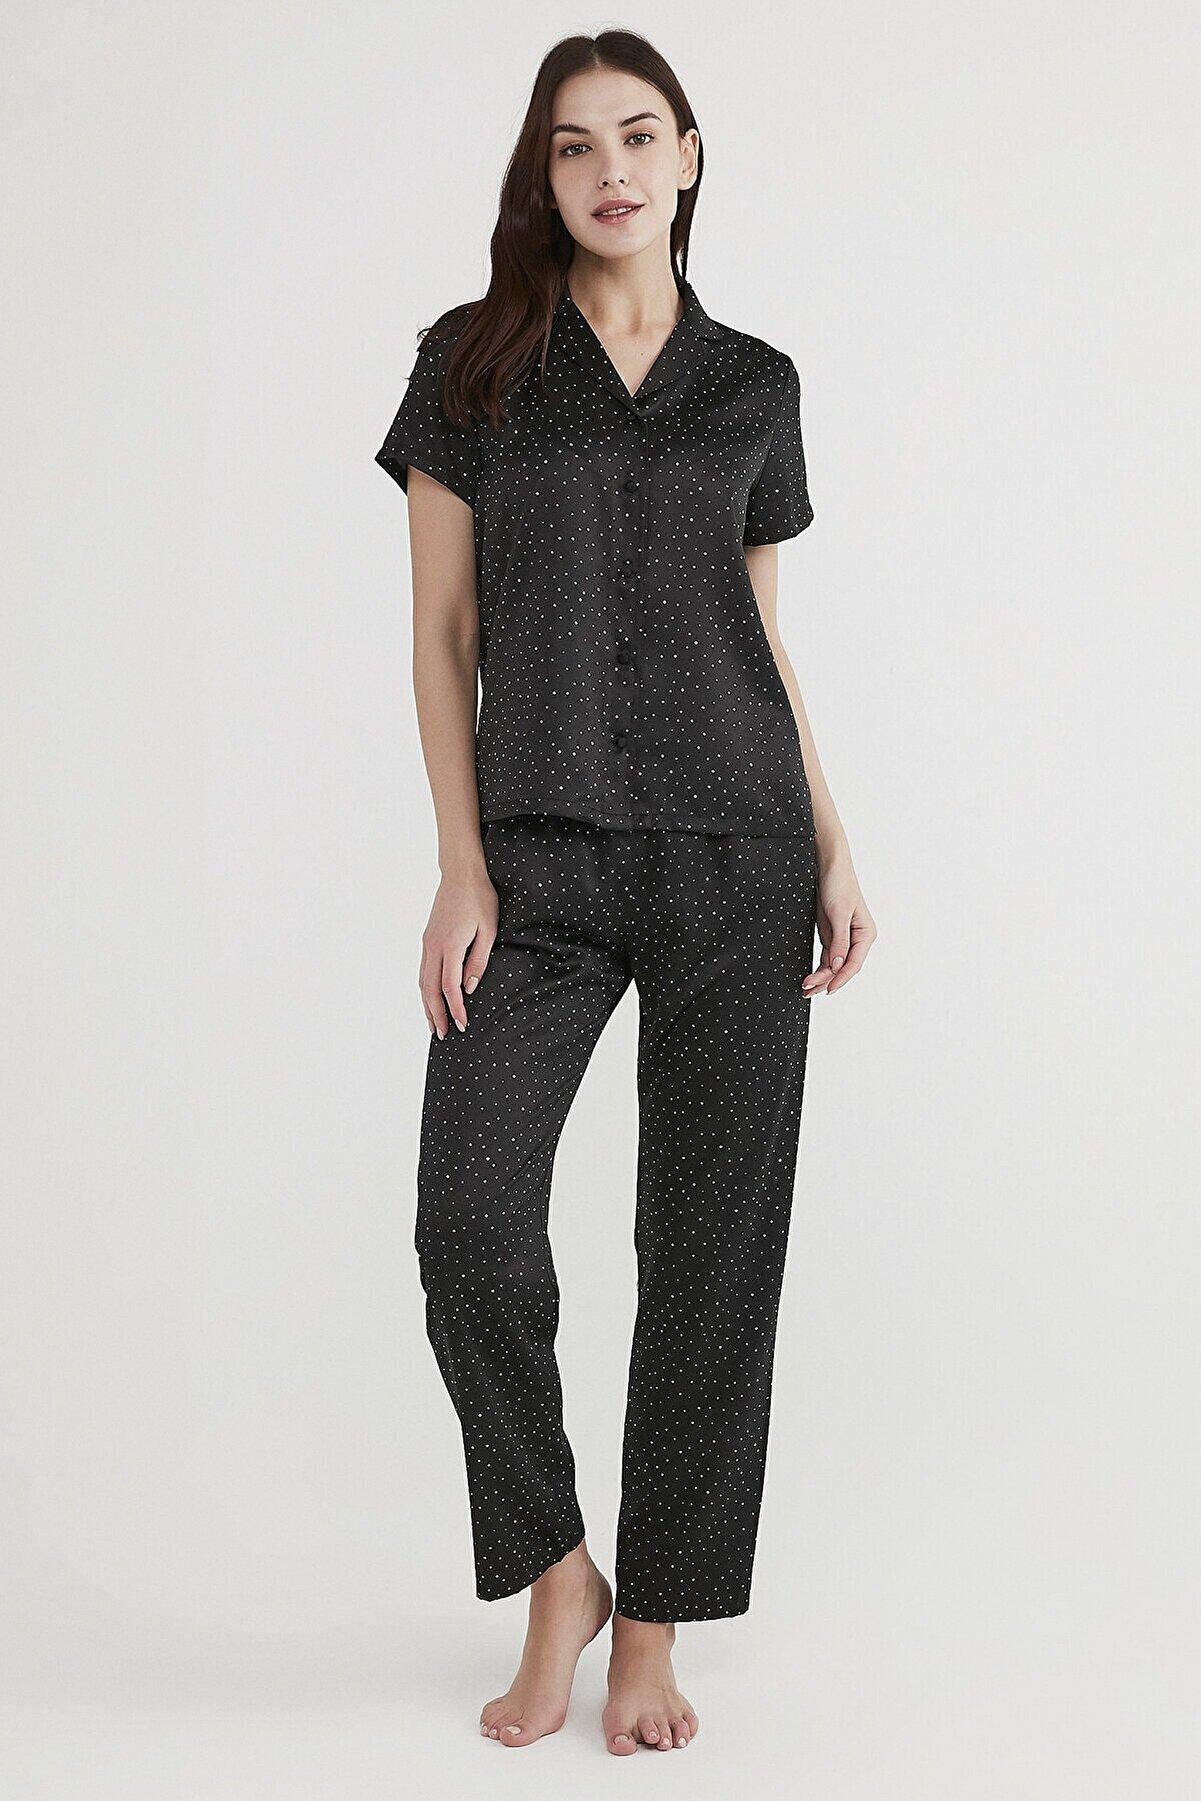 Penti Minimal Dark Saten Pijama Takımı